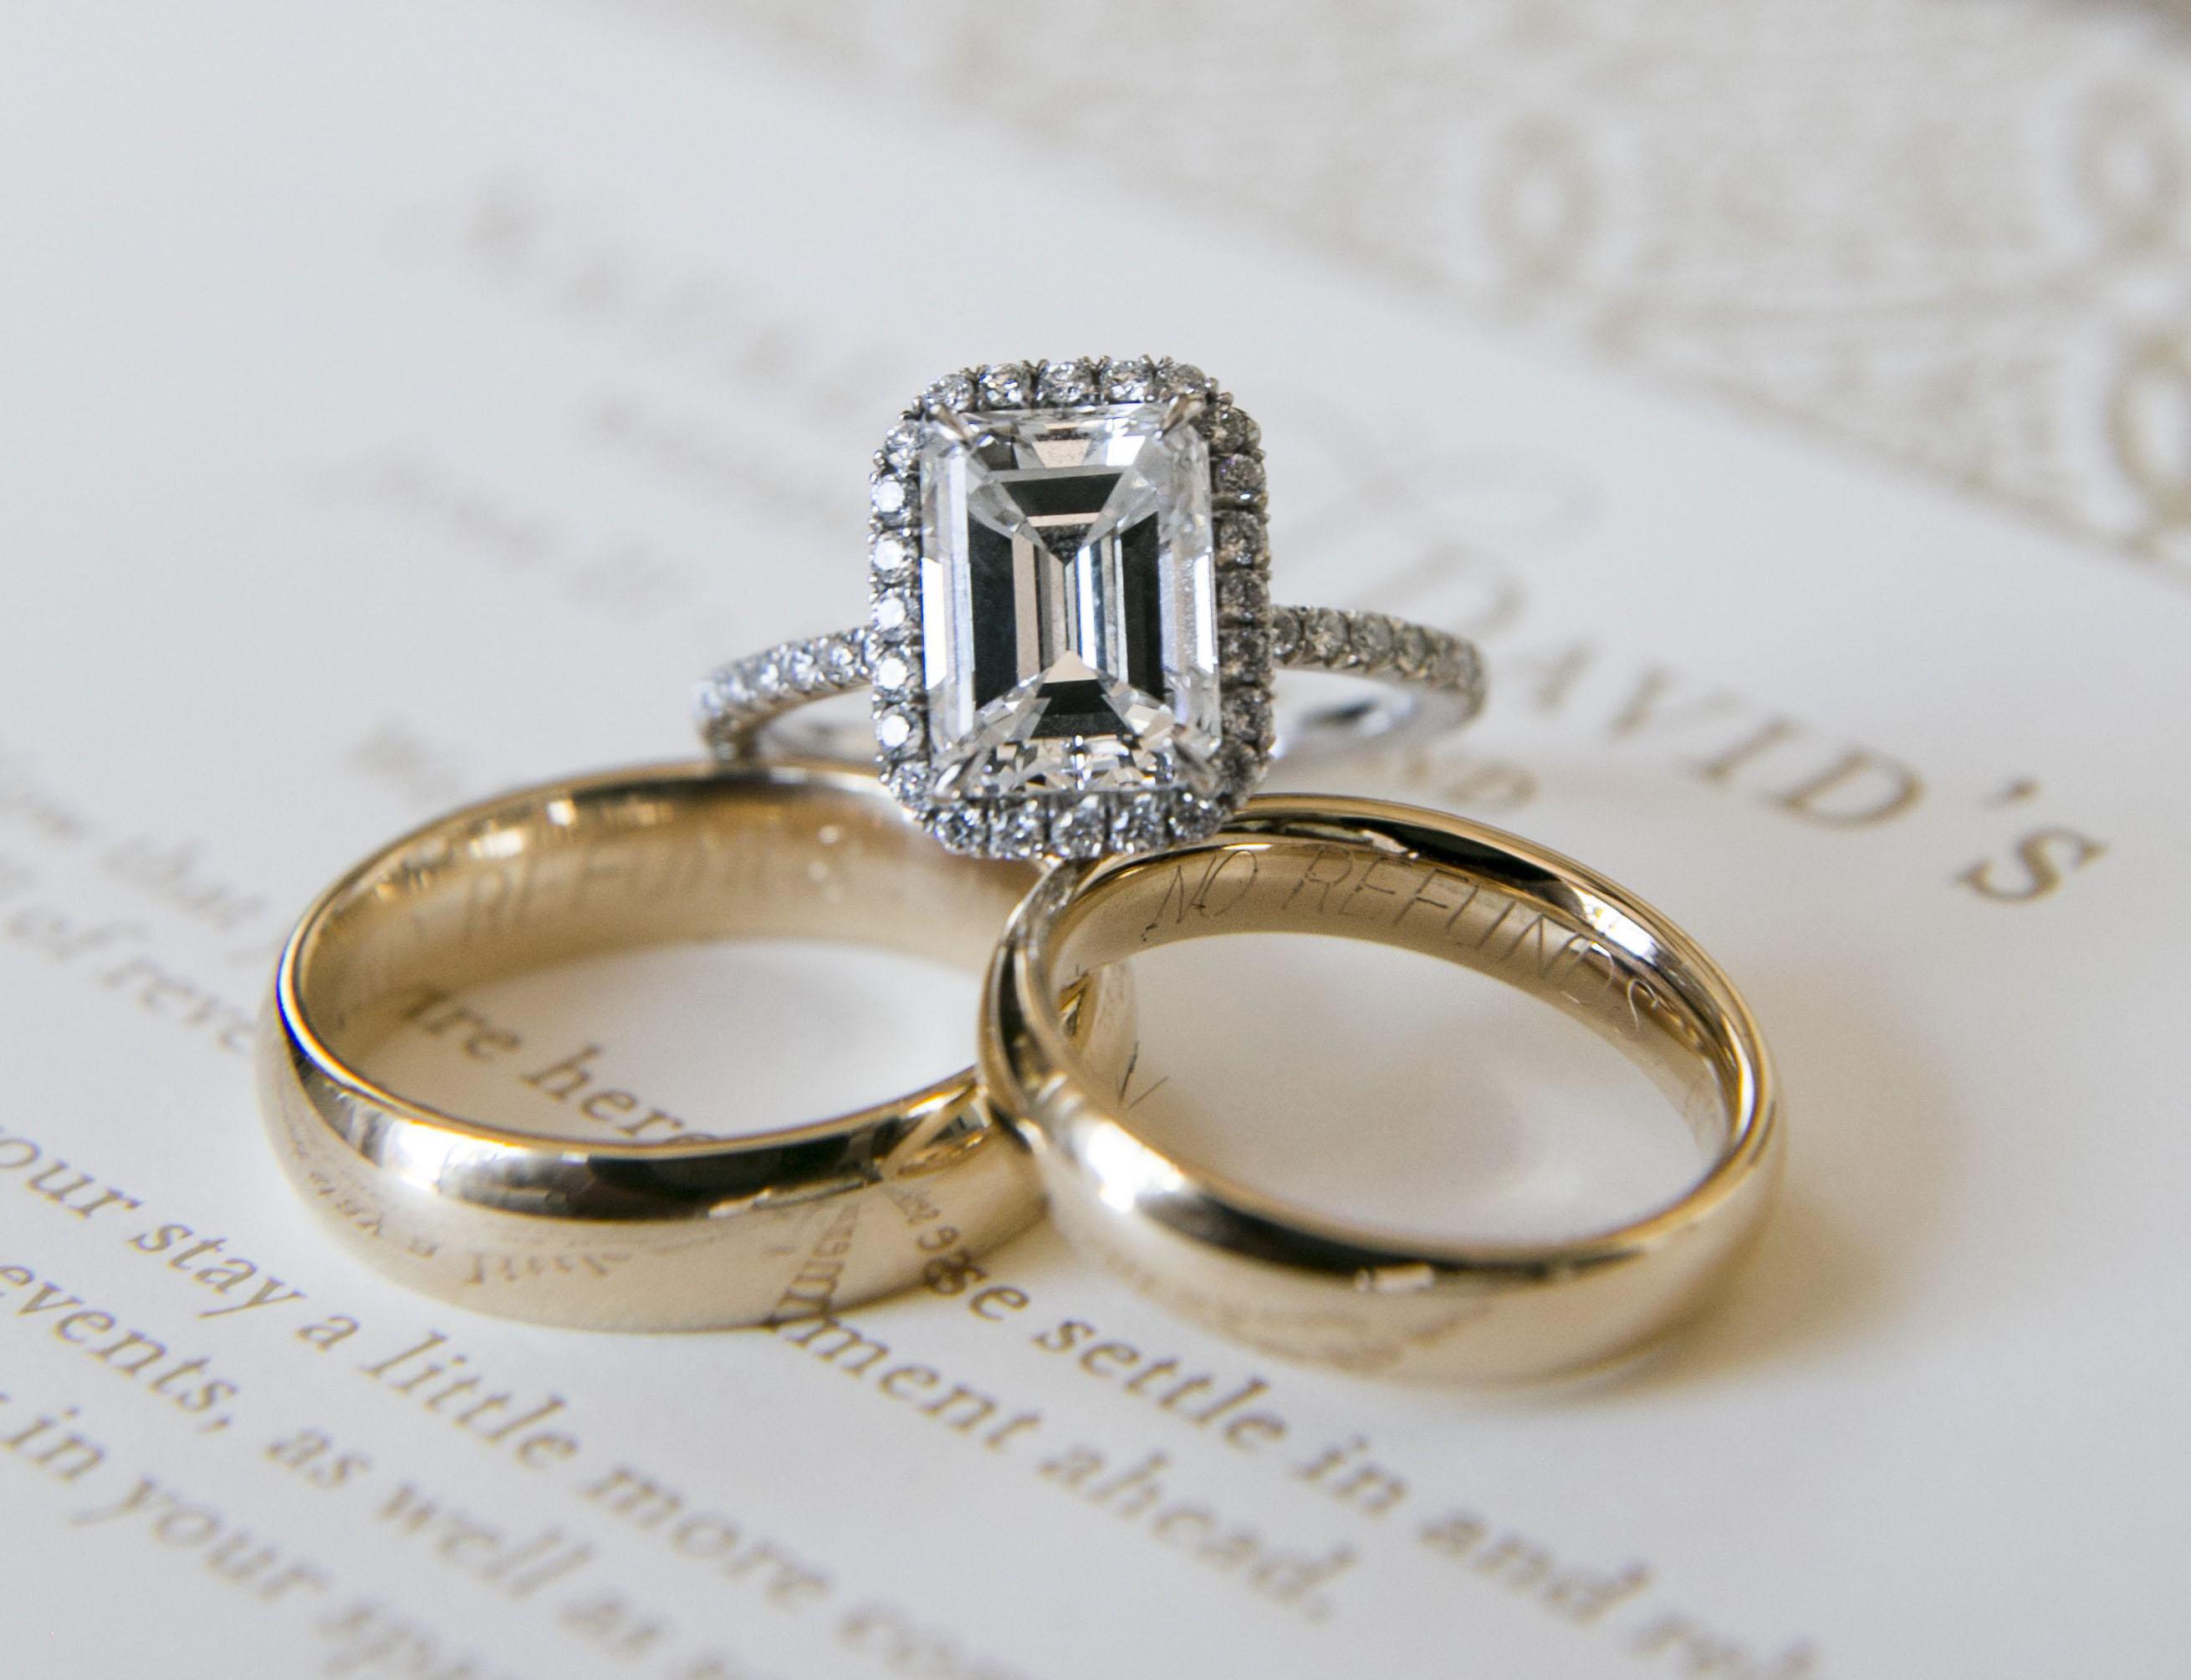 Adrienne bailon engagement ring inspiration emerald cut halo diamond